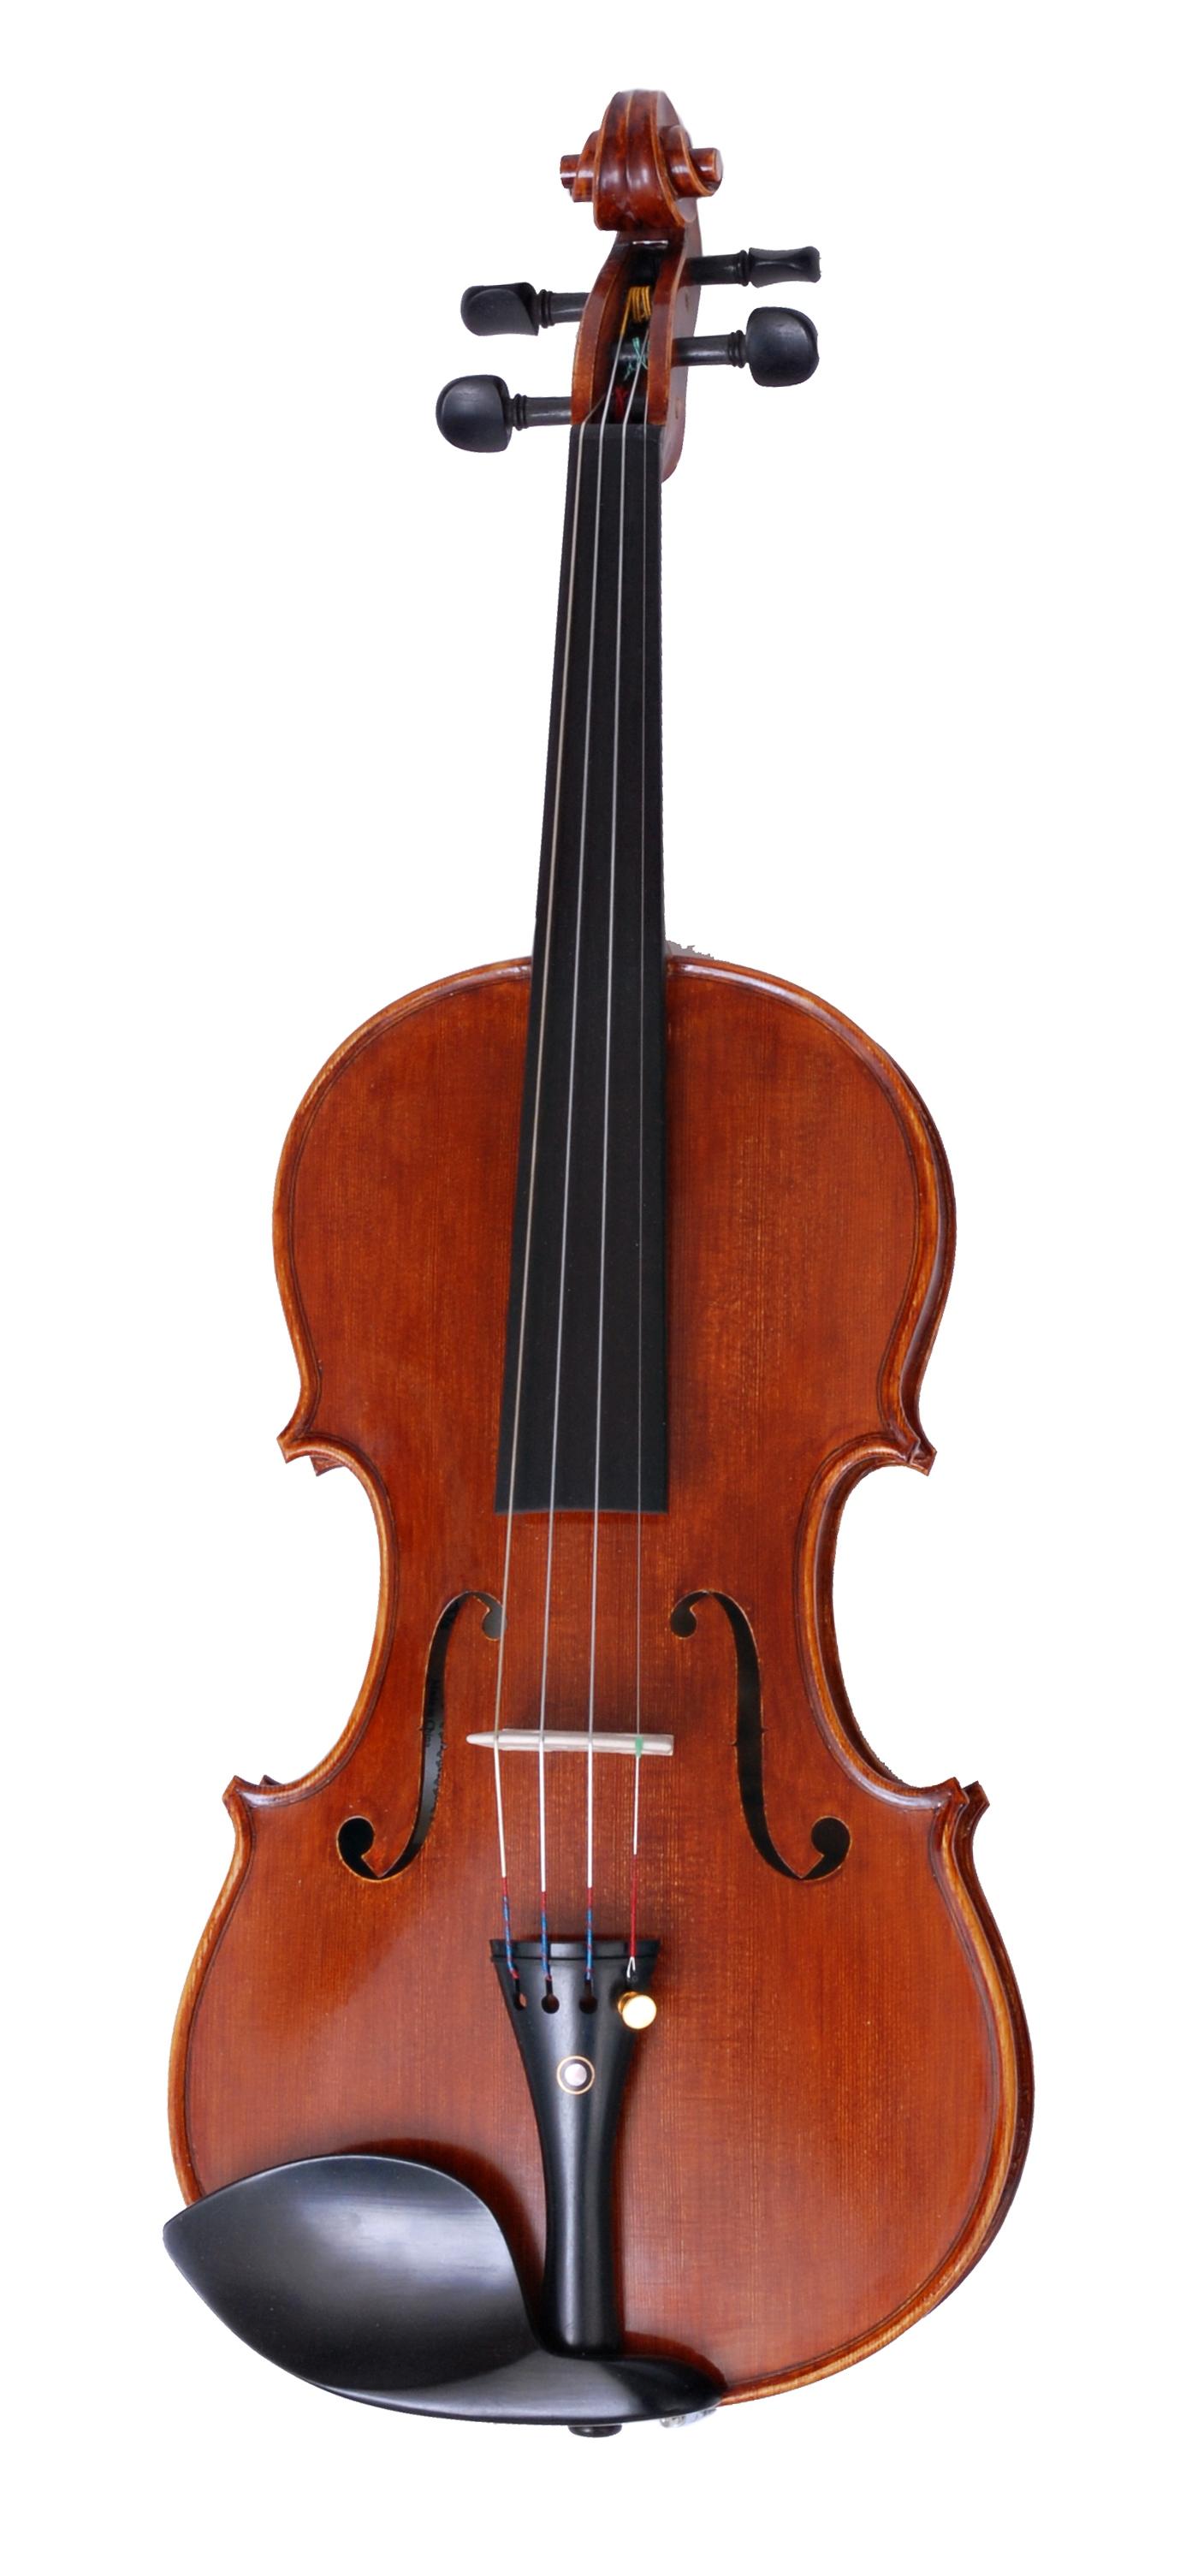 Erwin Otto 8044 violins.jpg